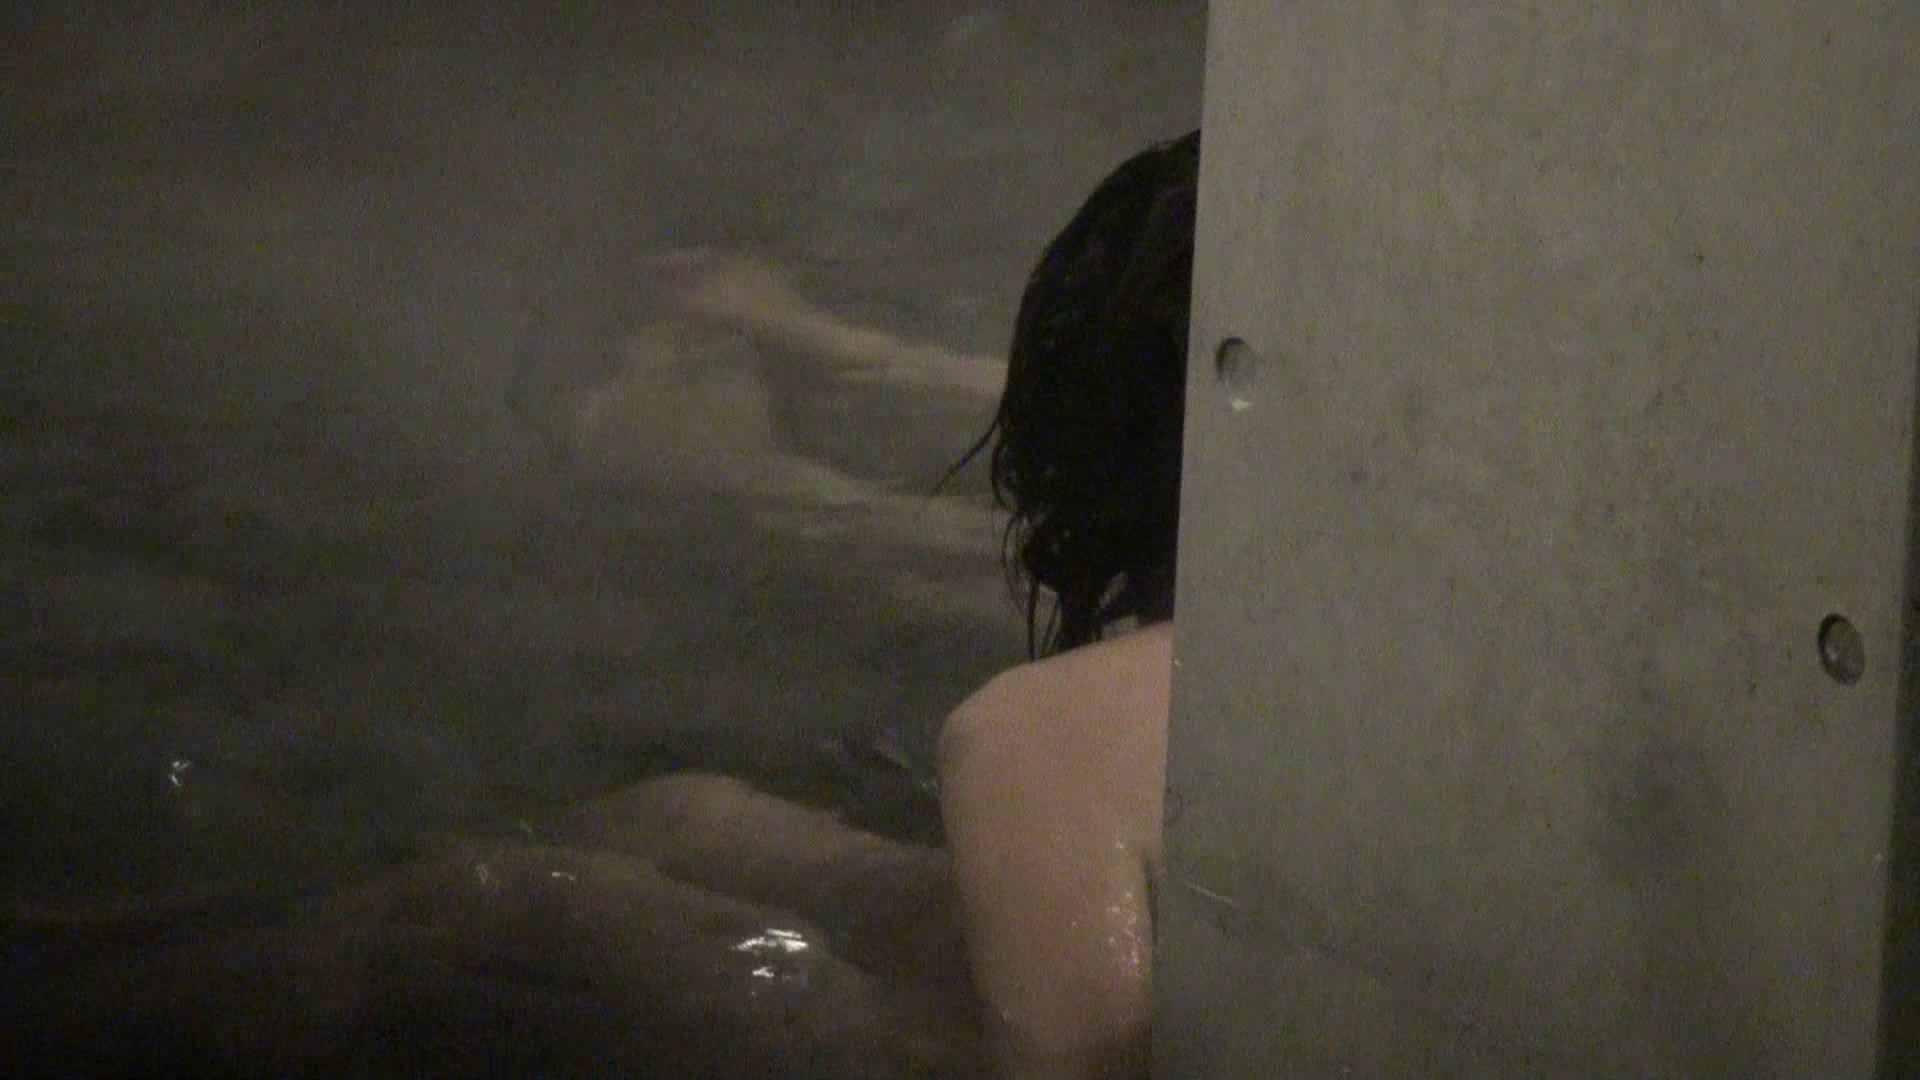 Aquaな露天風呂Vol.405 女体盗撮 盗撮オマンコ無修正動画無料 86連発 62